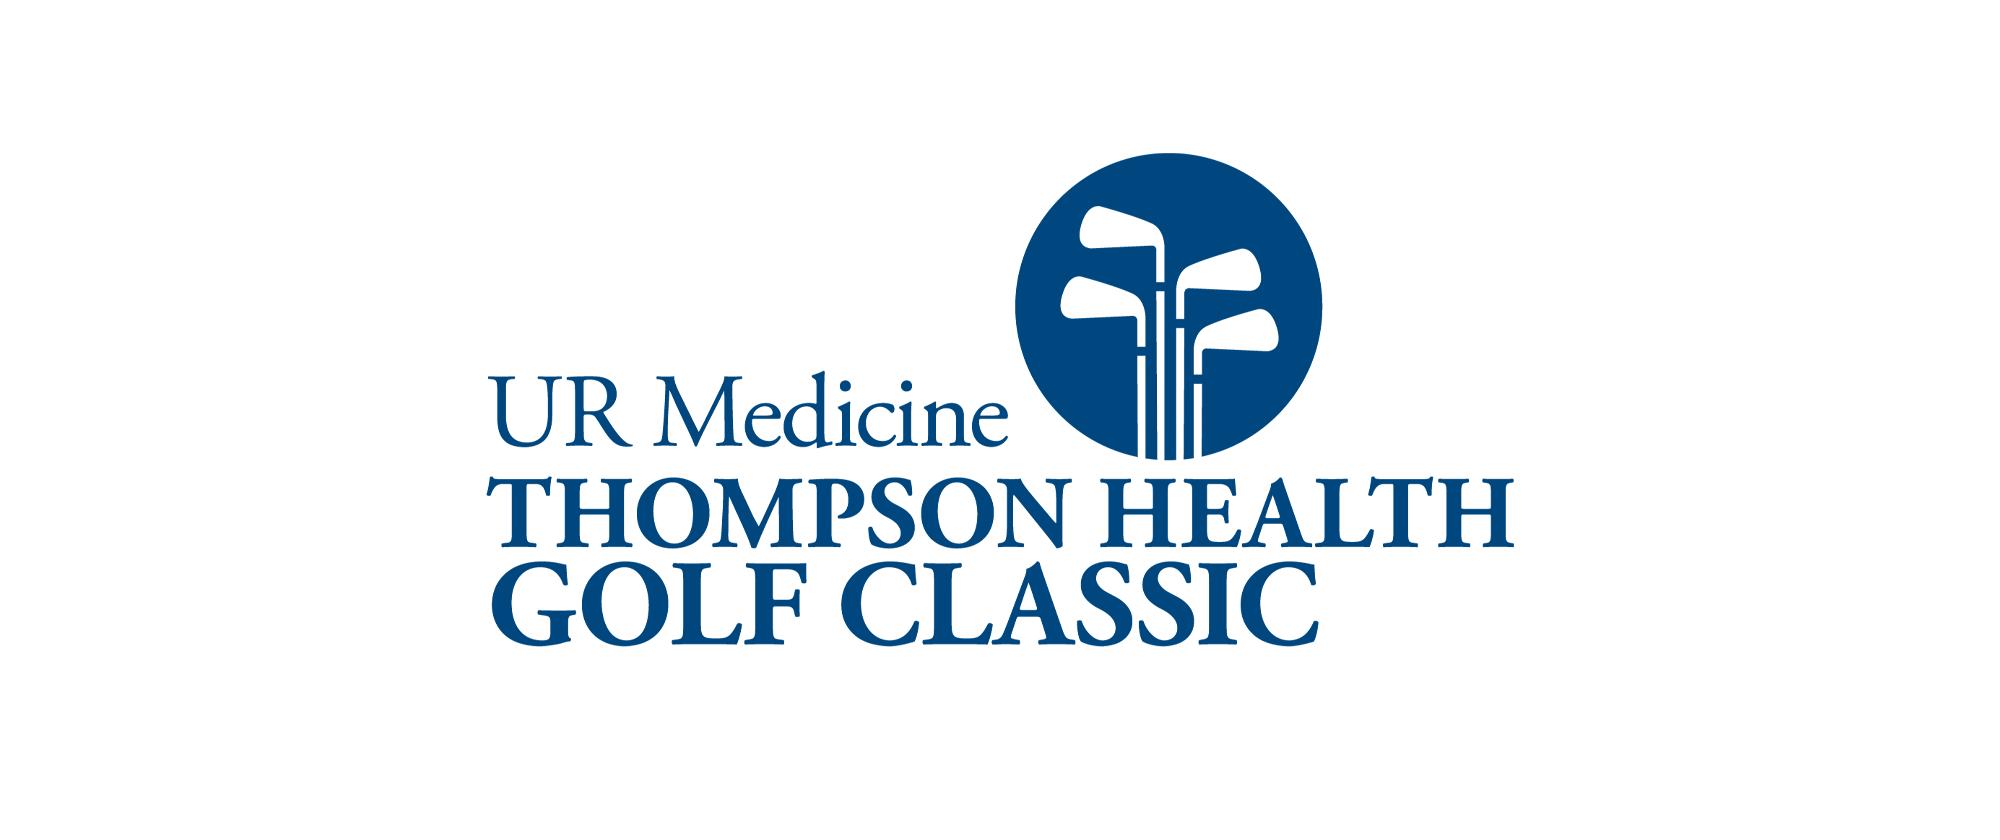 UR Medicine, Thompson Health Golf Classic